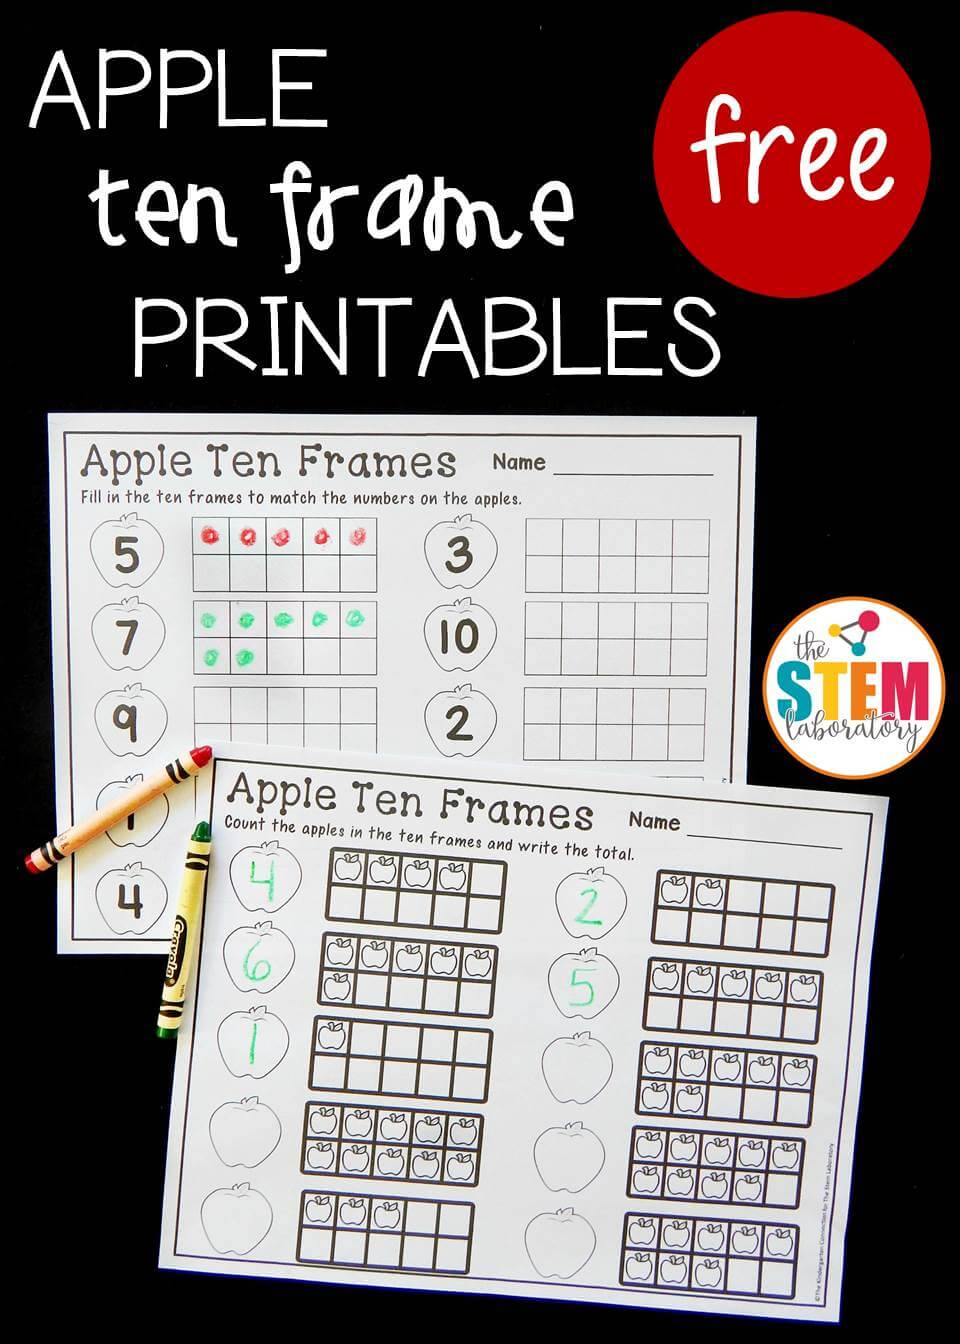 medium resolution of Apple Ten Frame Printables - The Stem Laboratory